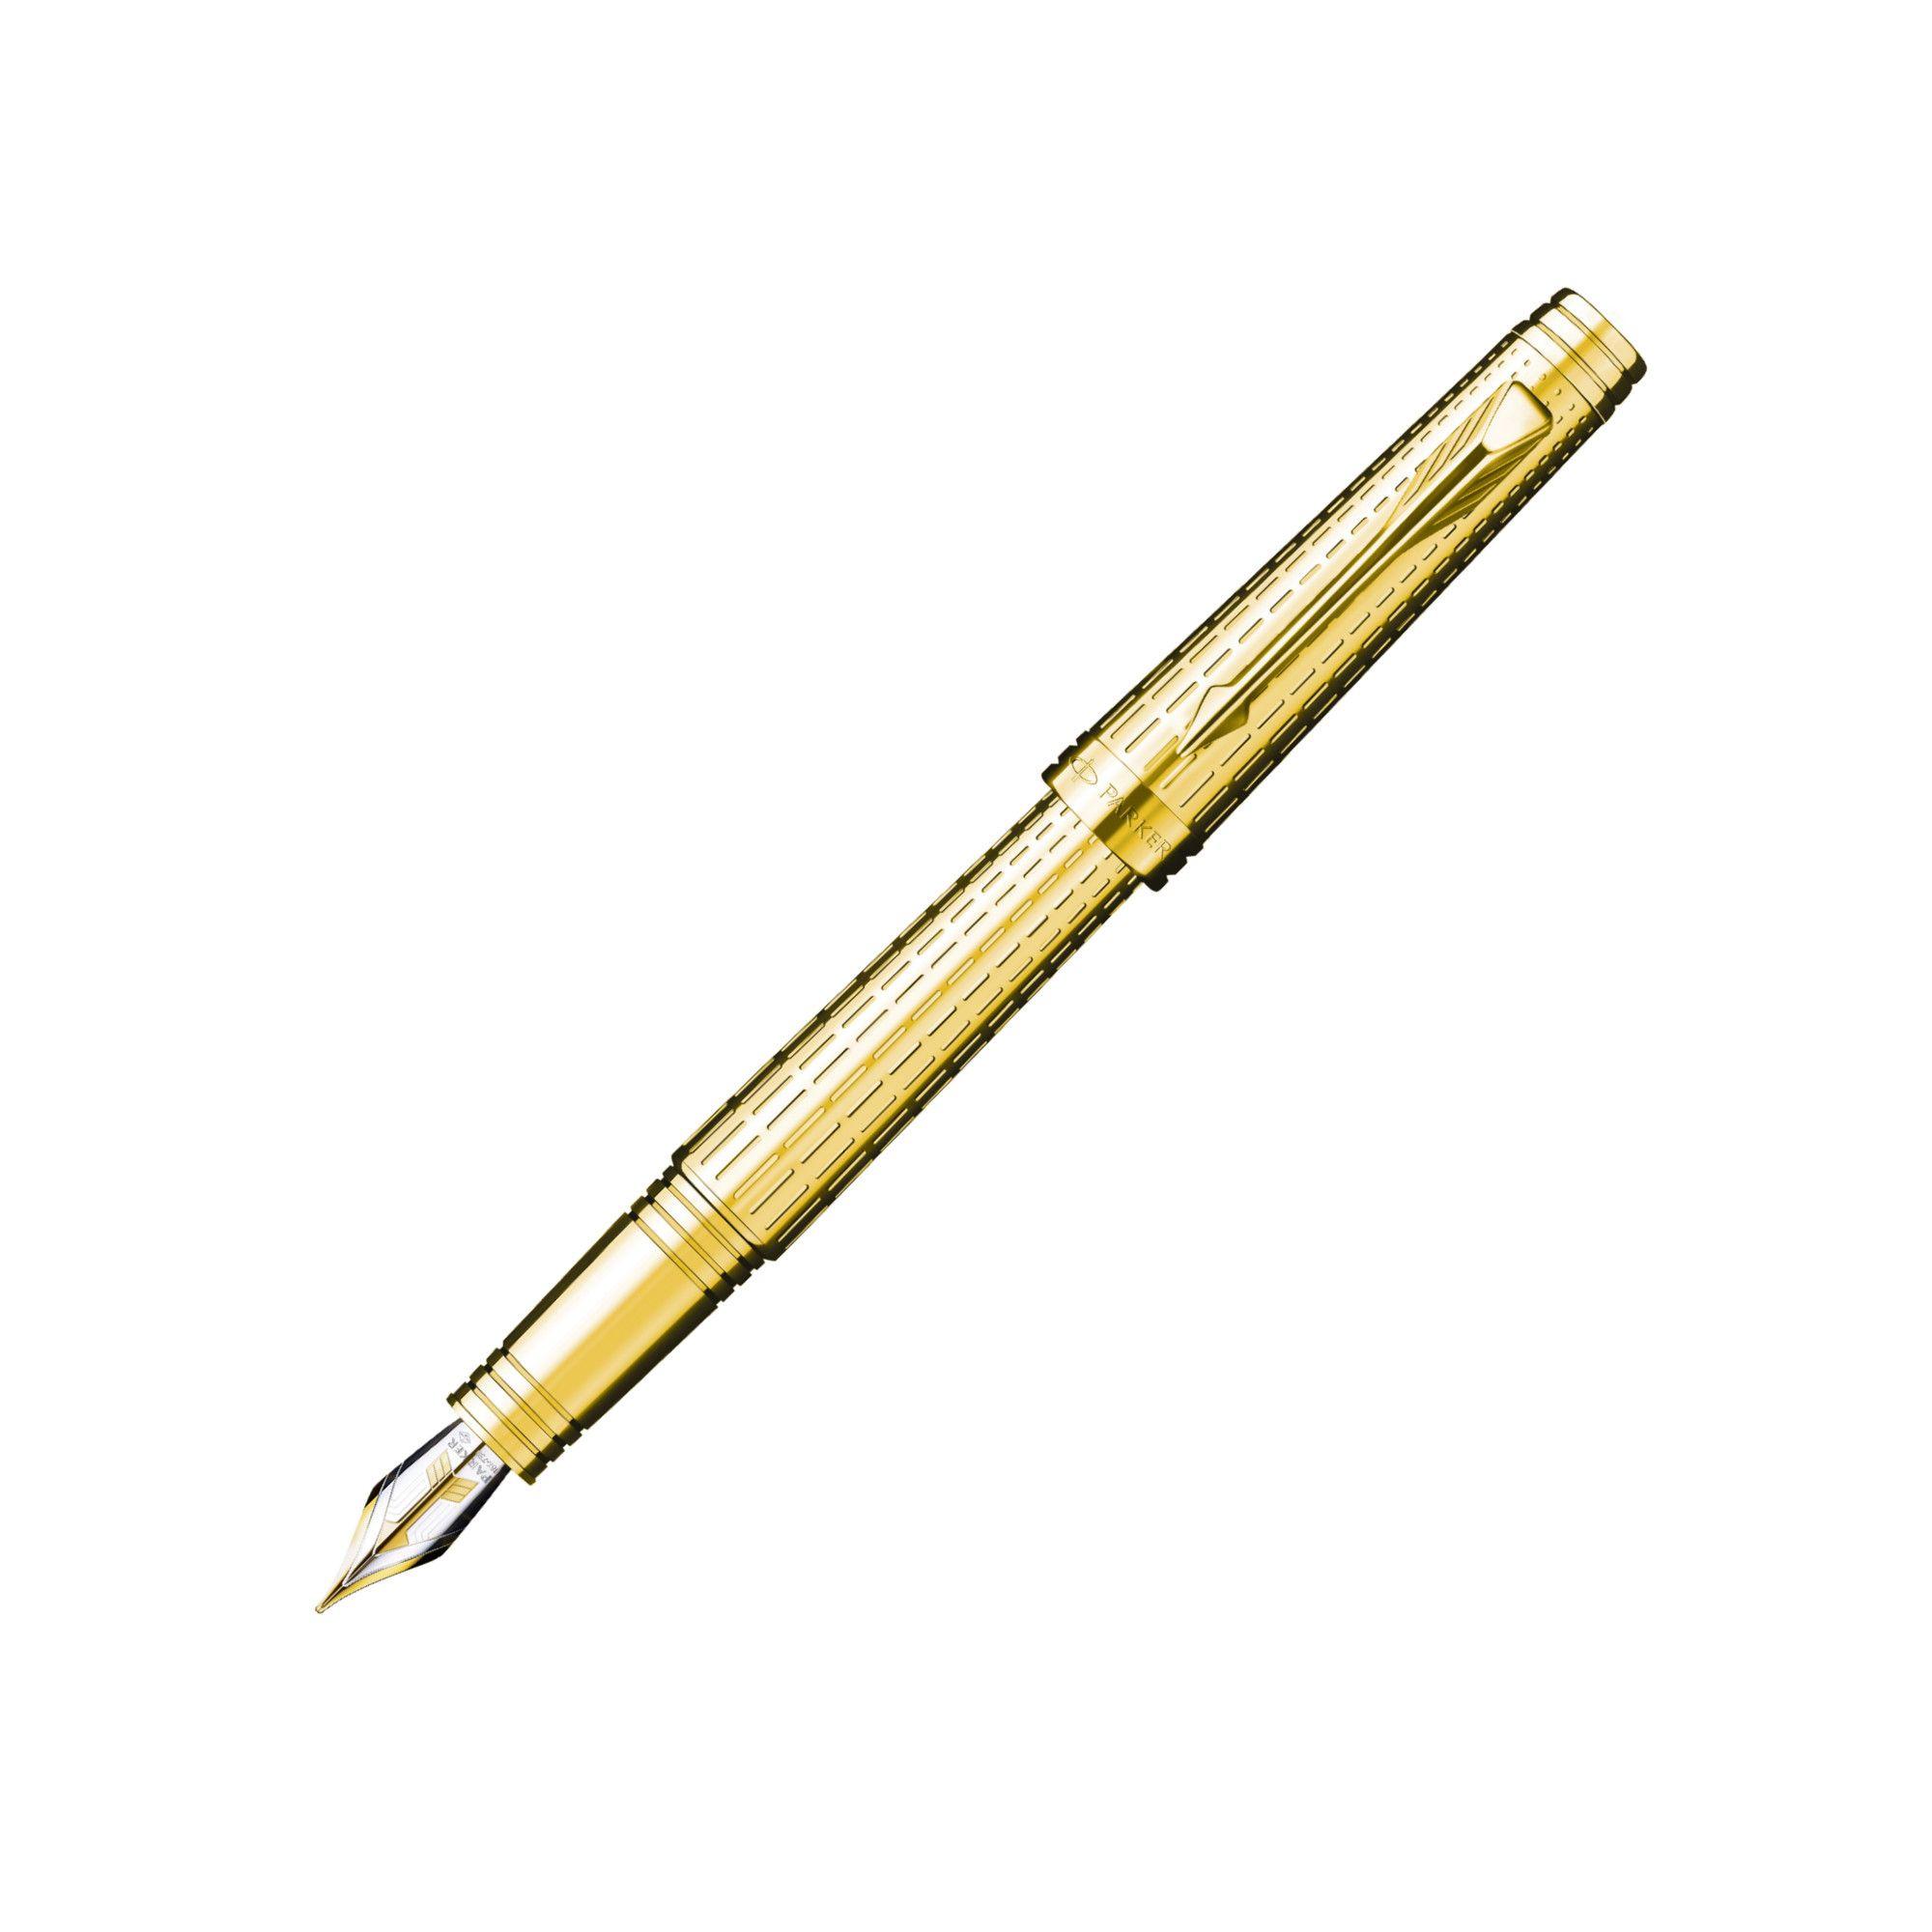 Premier Deluxe GT Fountain Pen at Tesco Direct